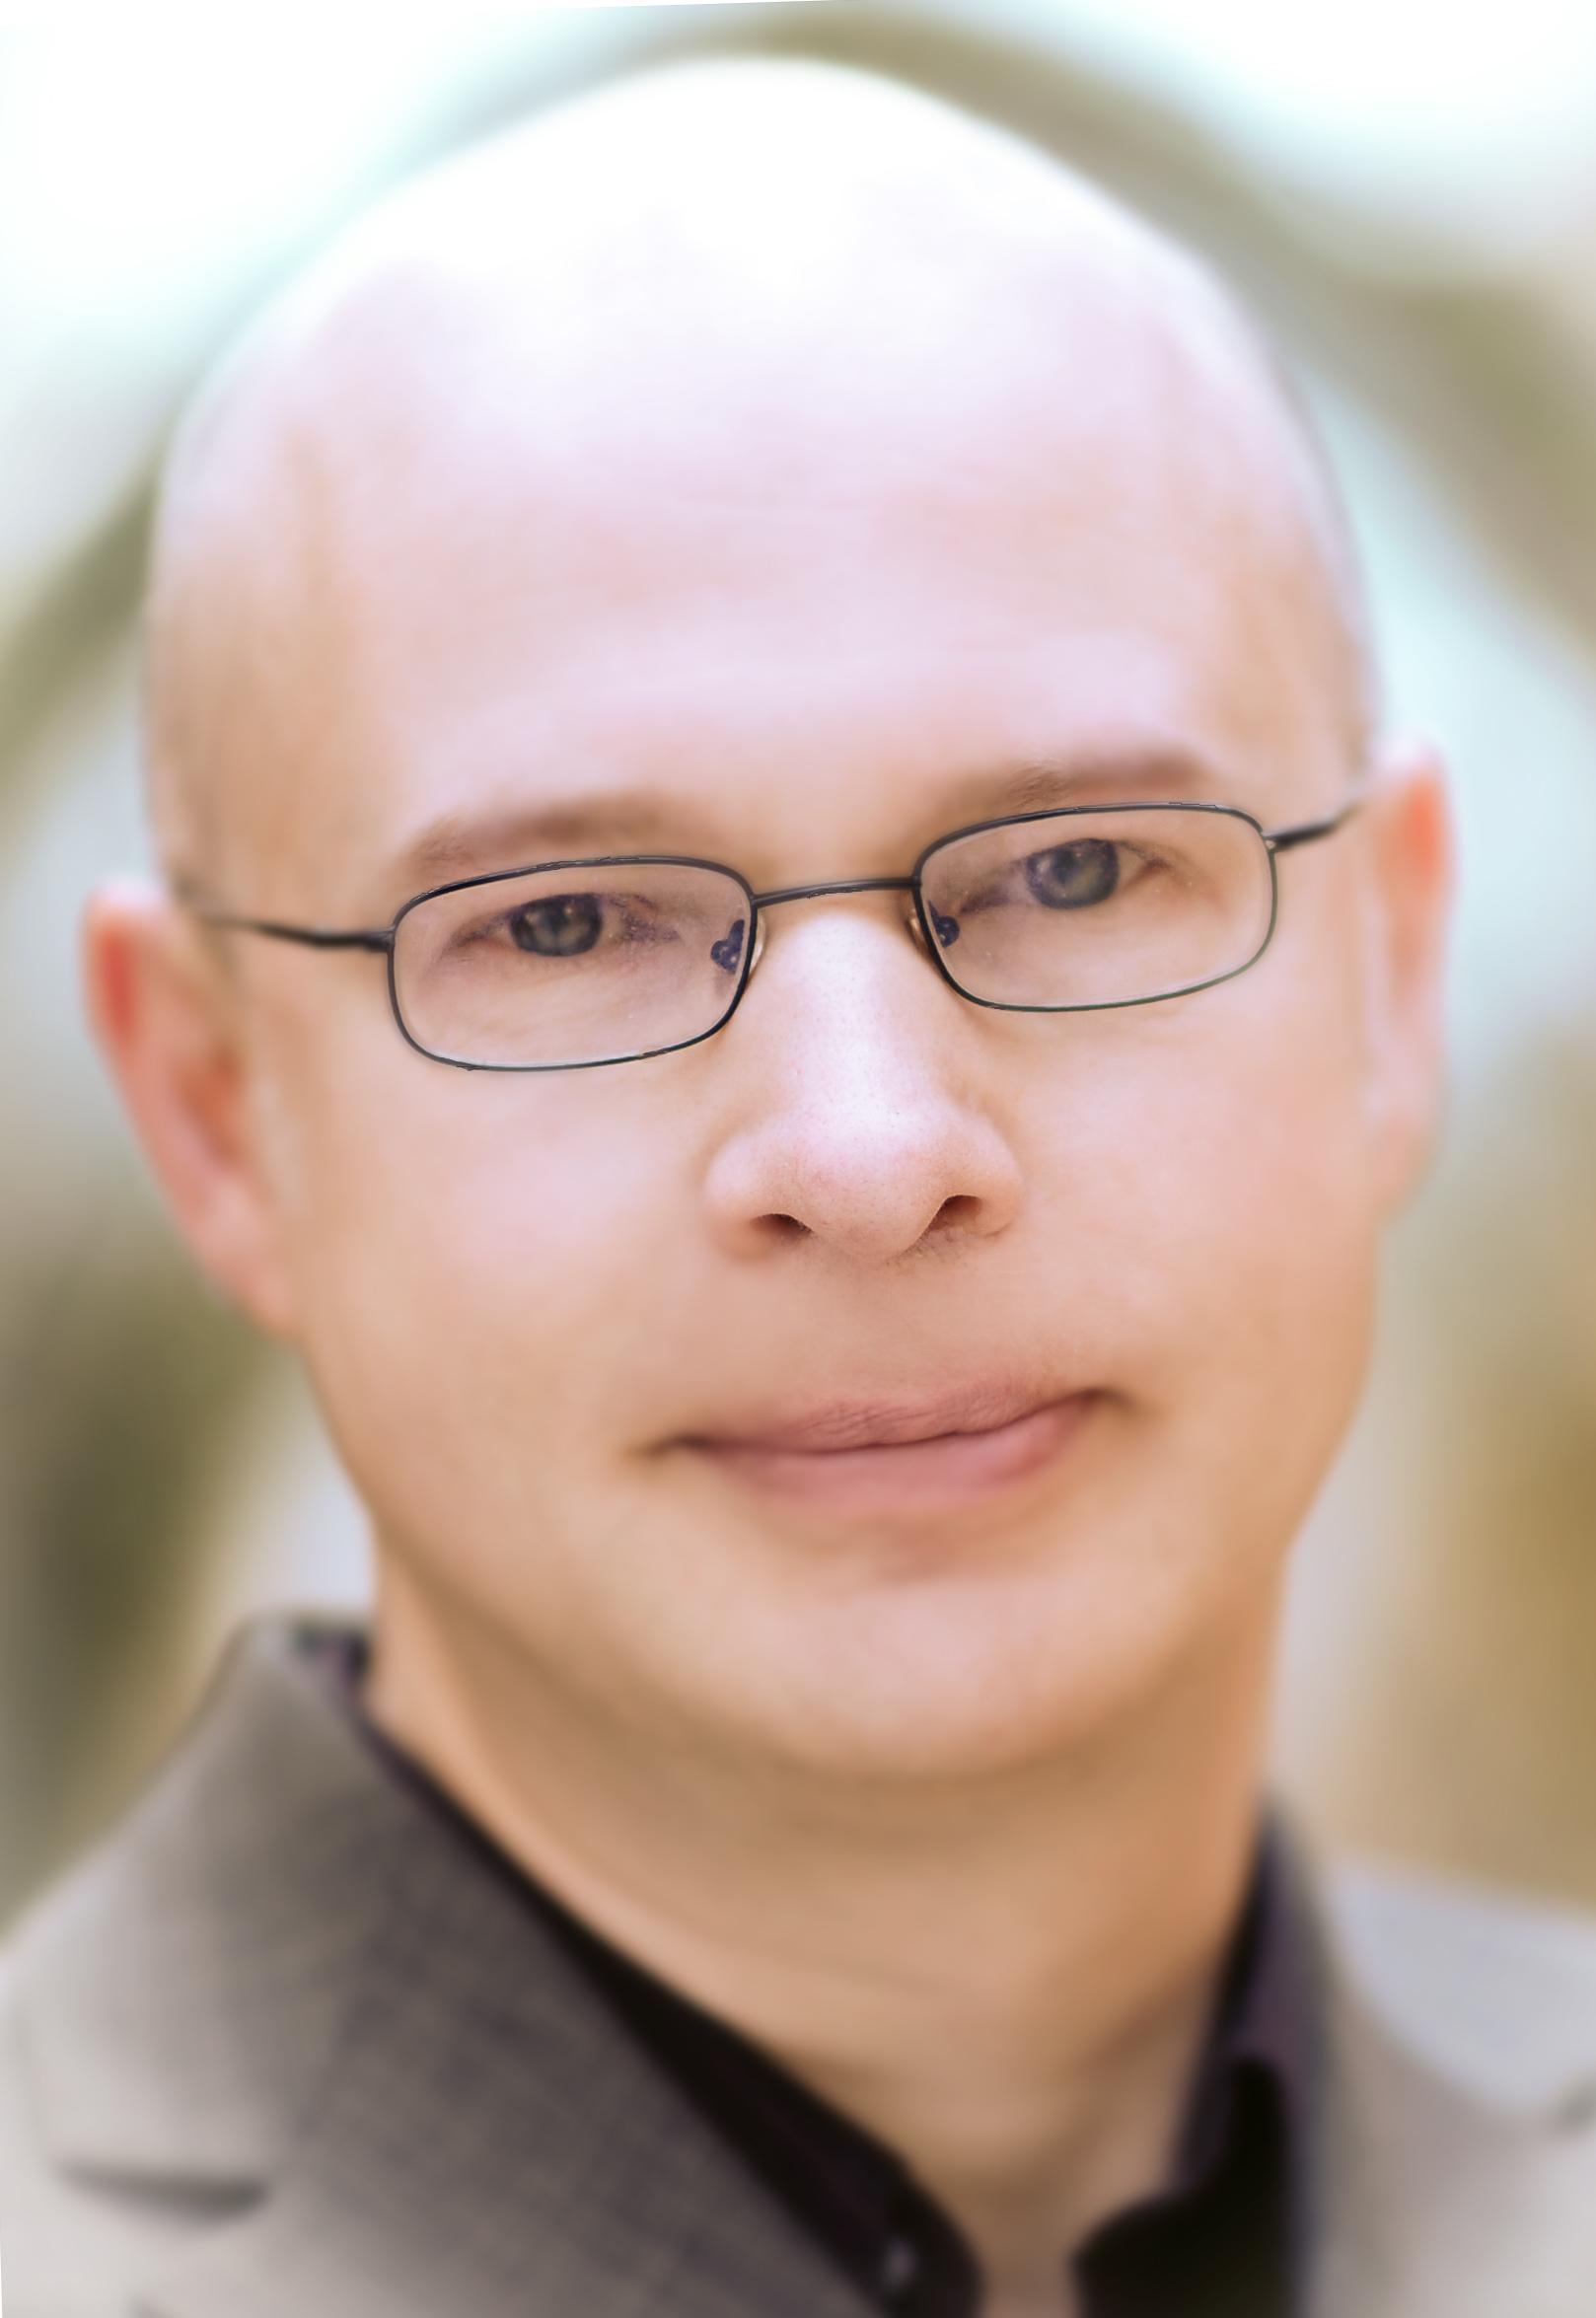 Umgang mit Eifersucht   Dr. phil. Elmar Basse   Hypnose